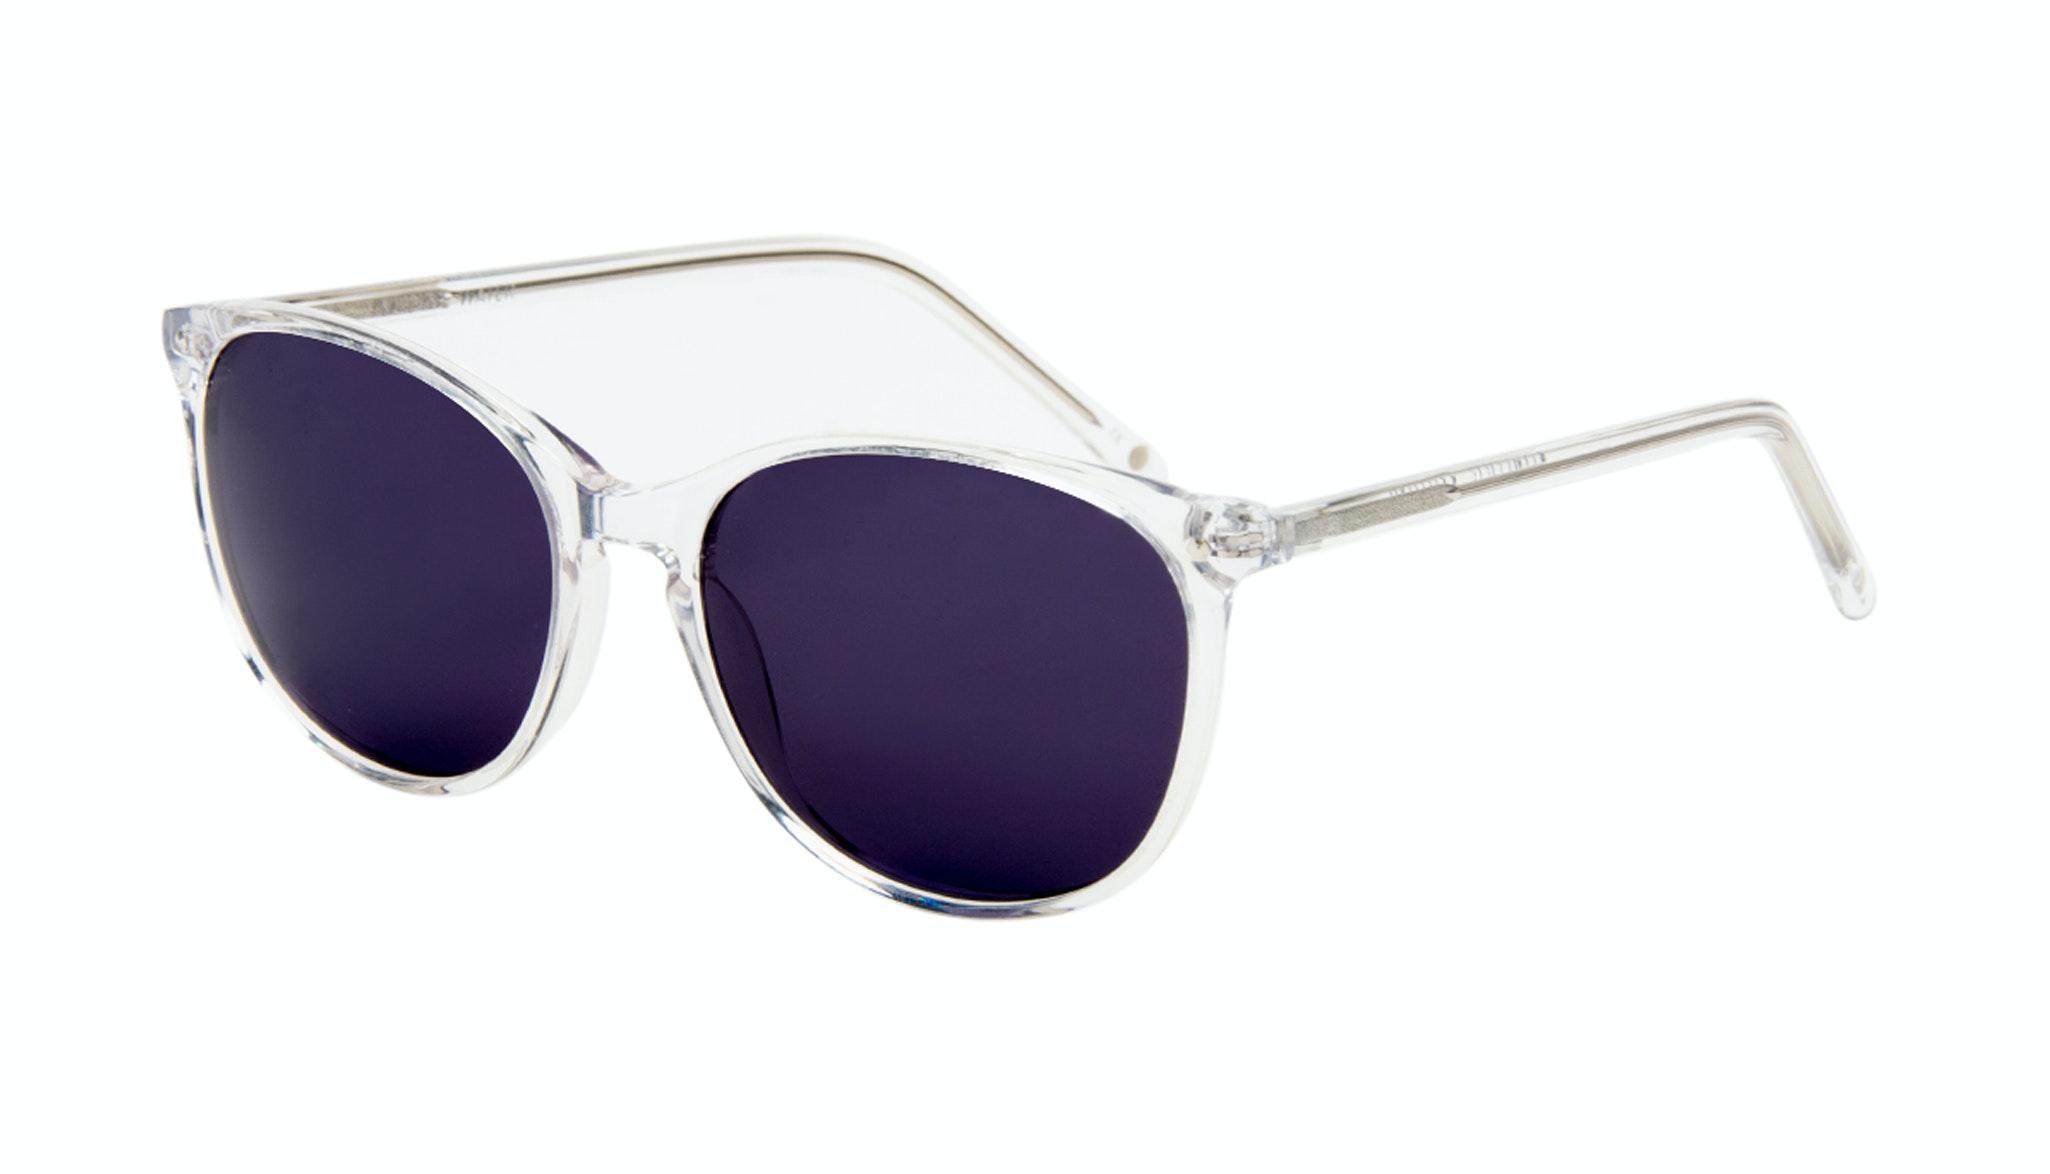 Affordable Fashion Glasses Rectangle Square Round Sunglasses Women Nadine Water Tilt